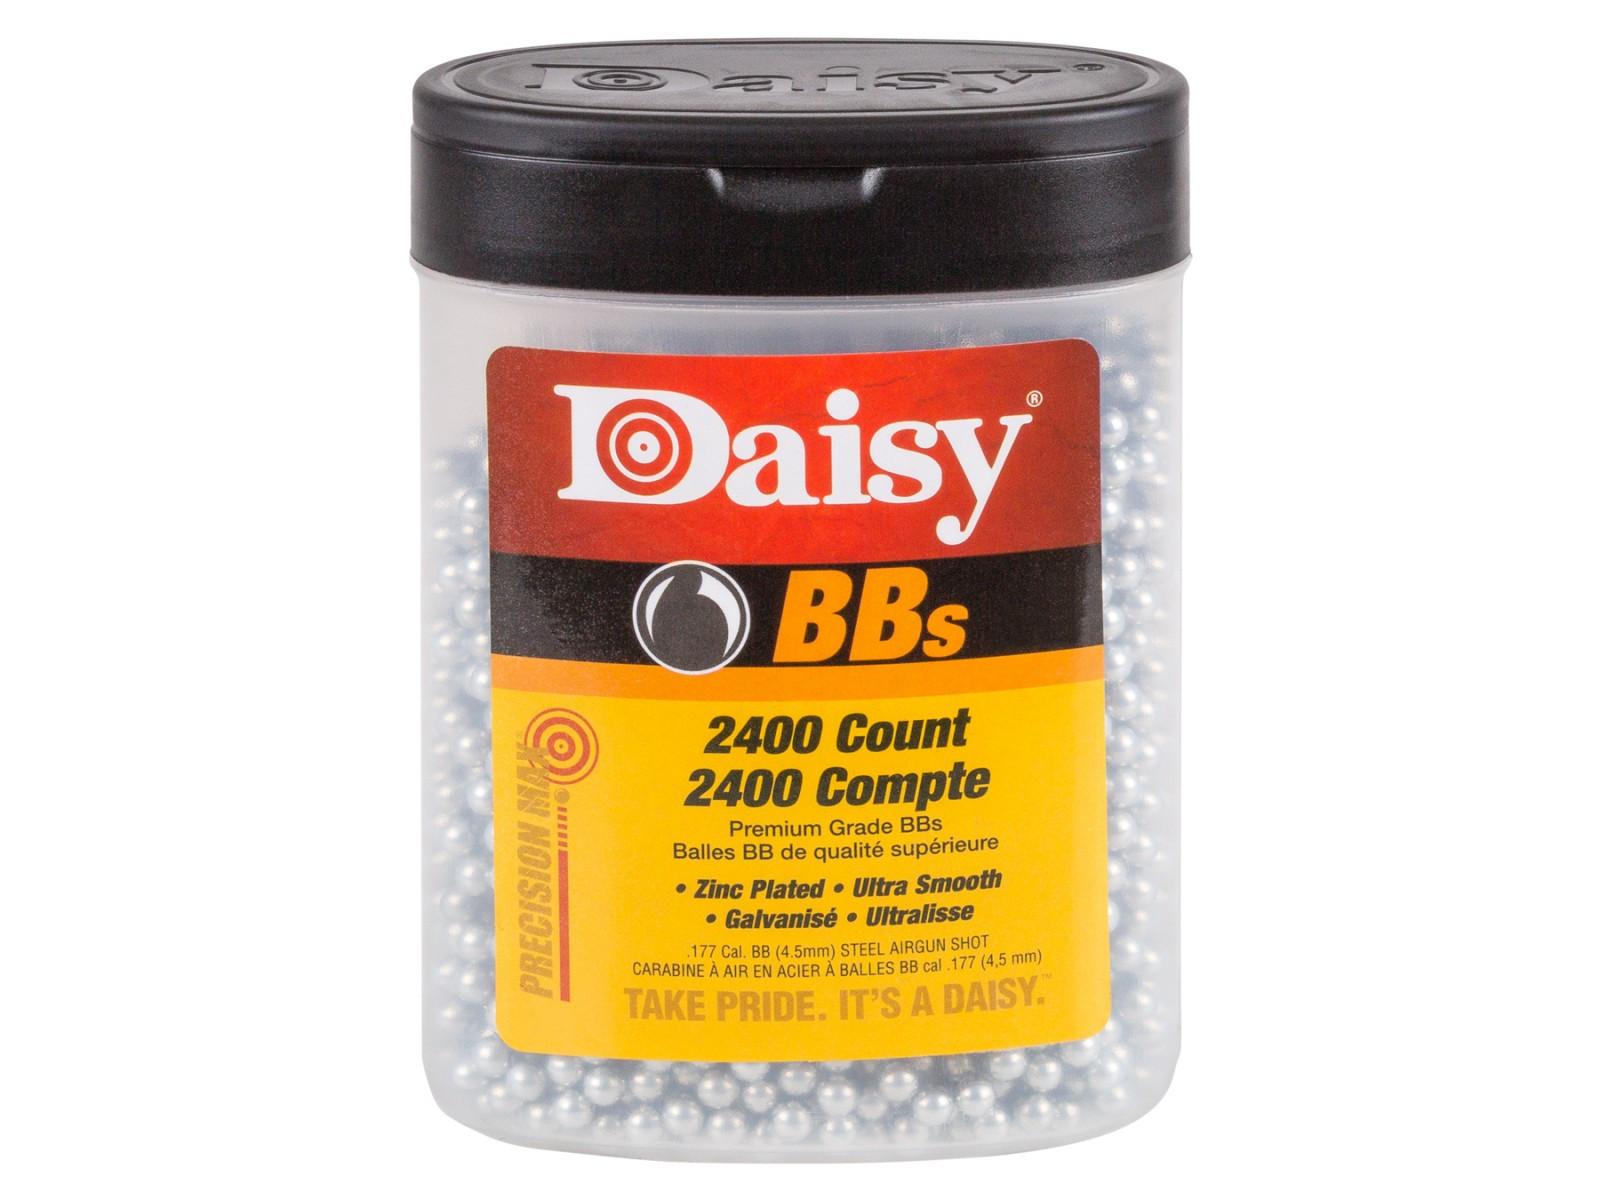 Daisy Premium Grade BBs .177 Cal, 5.1 Grains, Zinc Plated (2400ct)